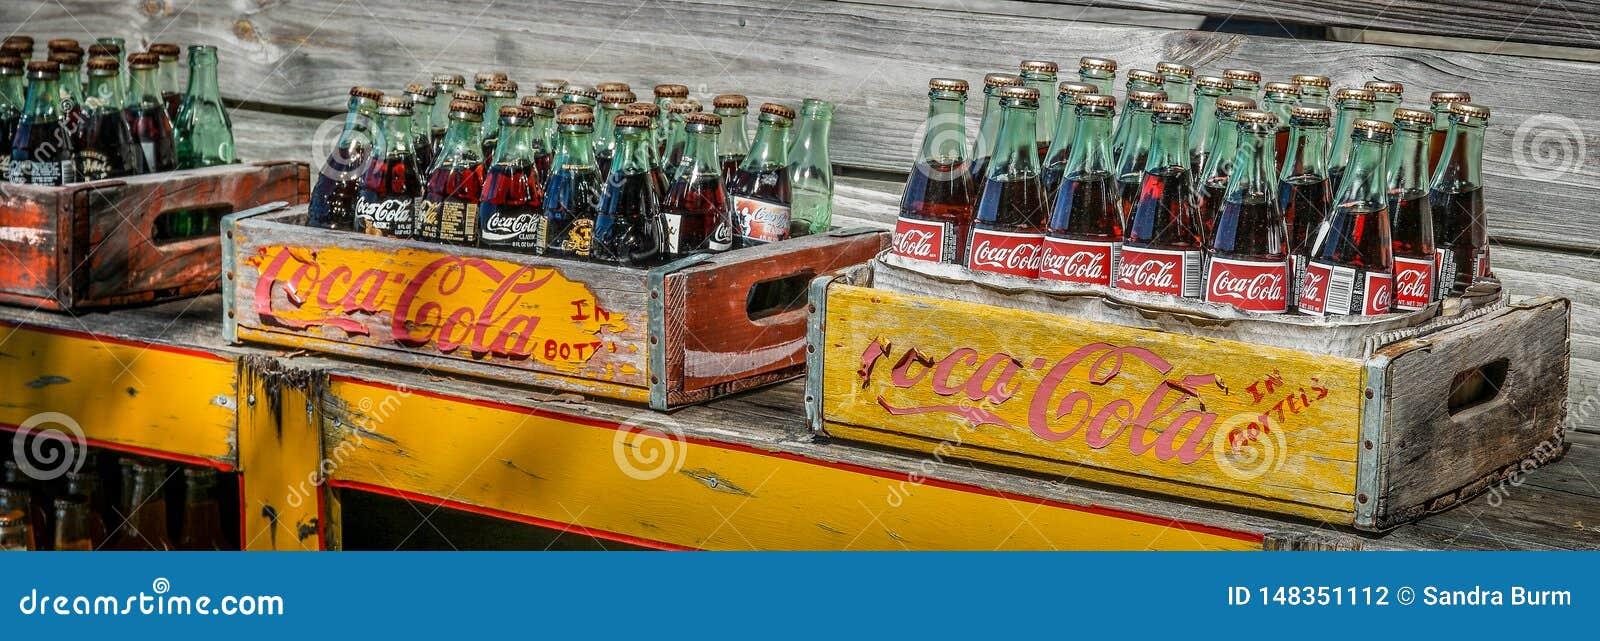 Bottles cocaen - colatappning